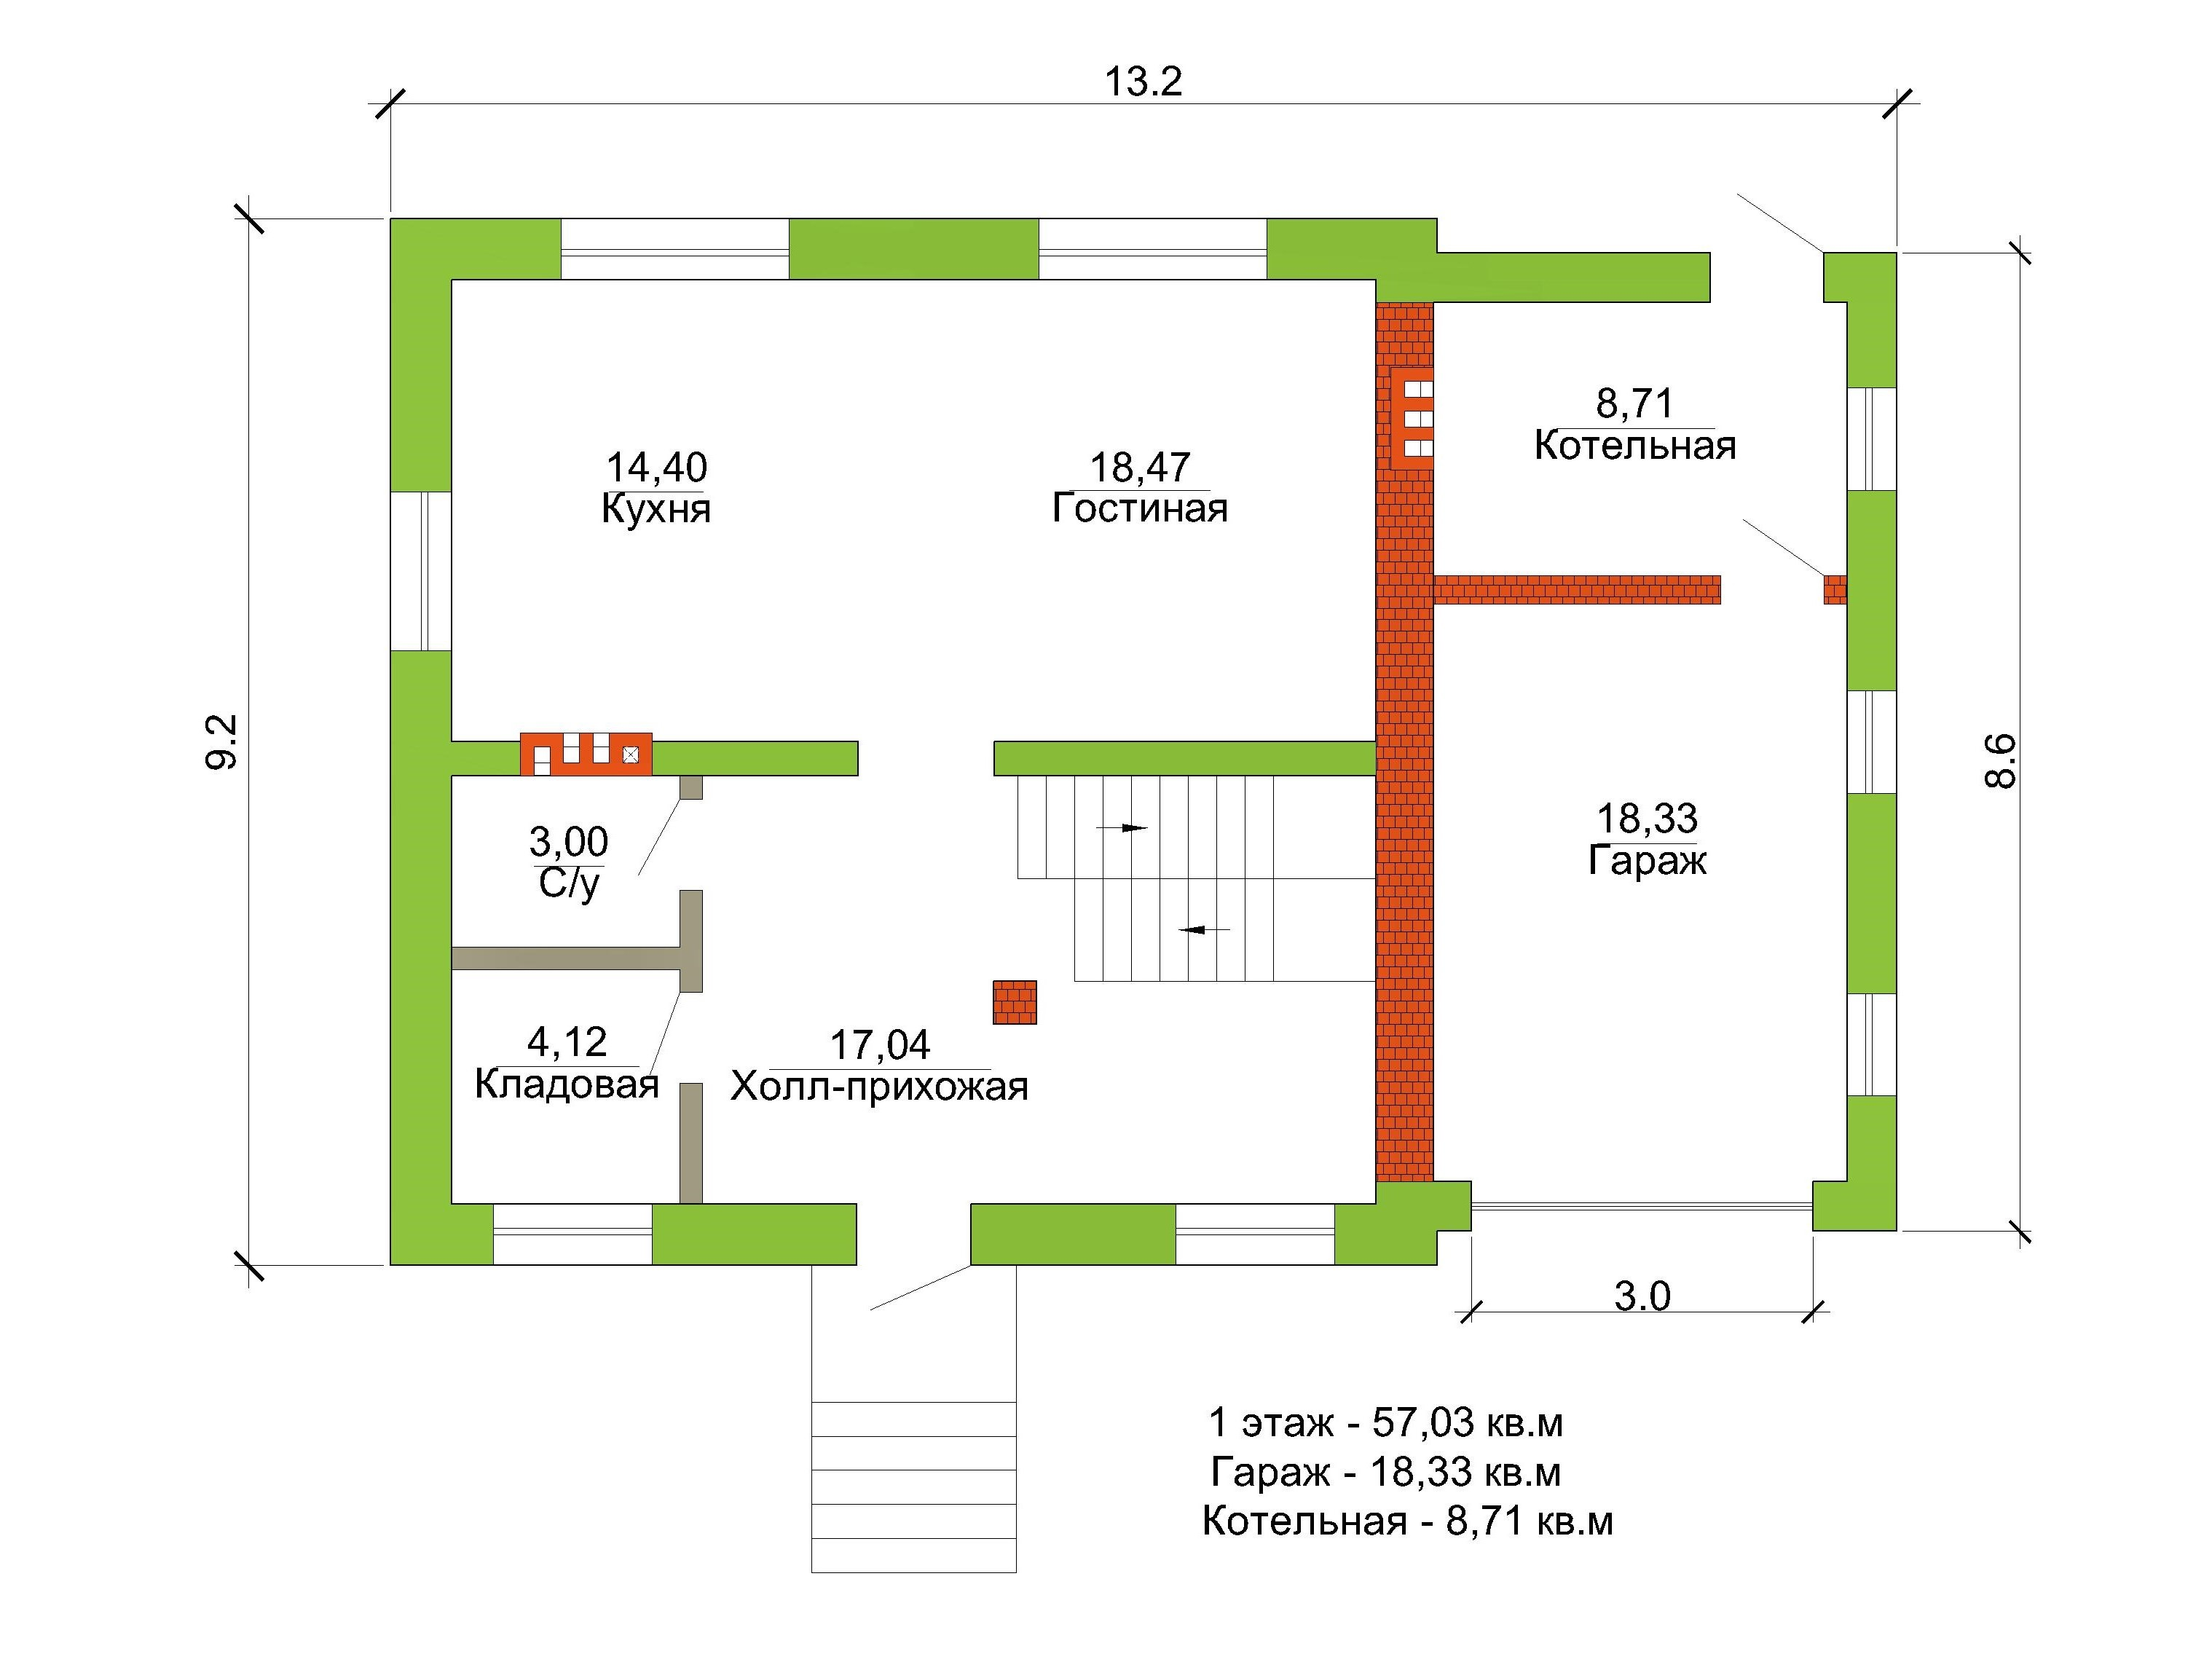 Готовый проект коттеджа 140 кв. м / Артикул ЦЕ-126 план